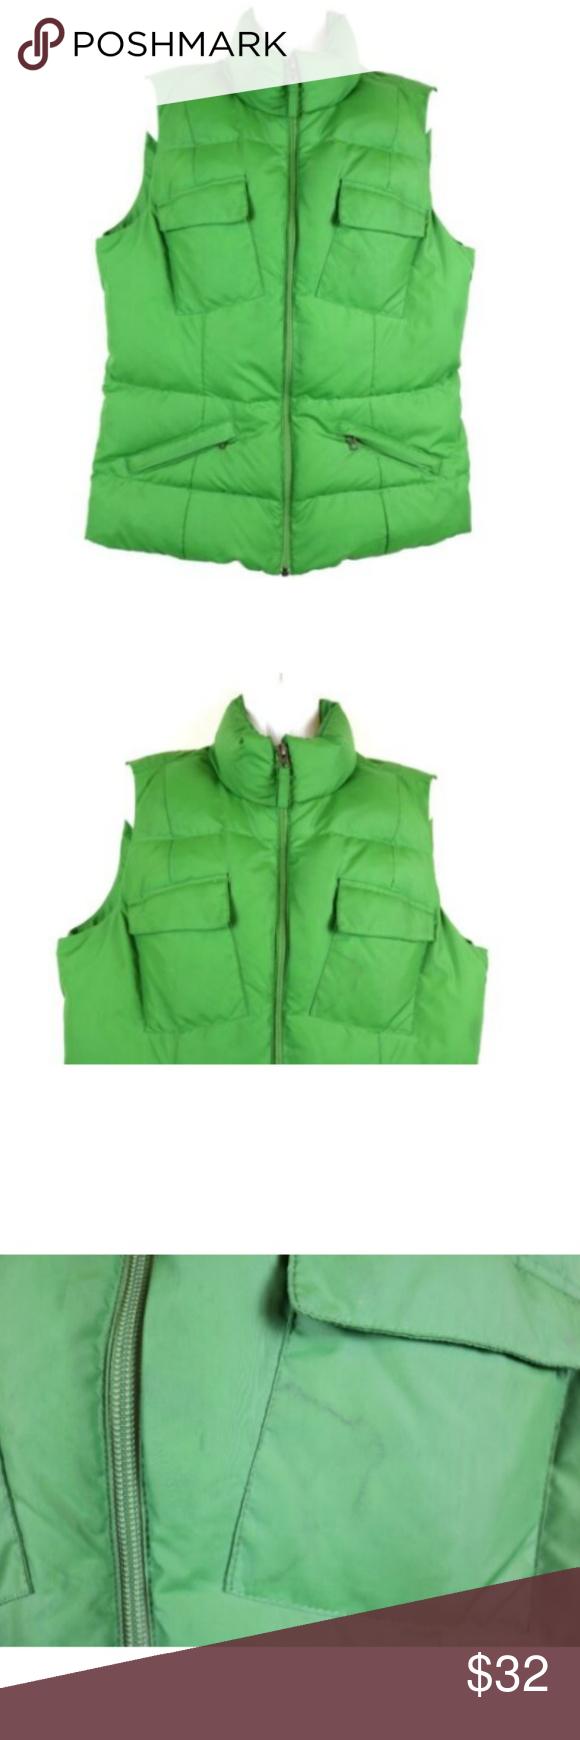 Tommy Hilfiger Womens Vest Down Puffer Green Clothes Design Fashion Fashion Design